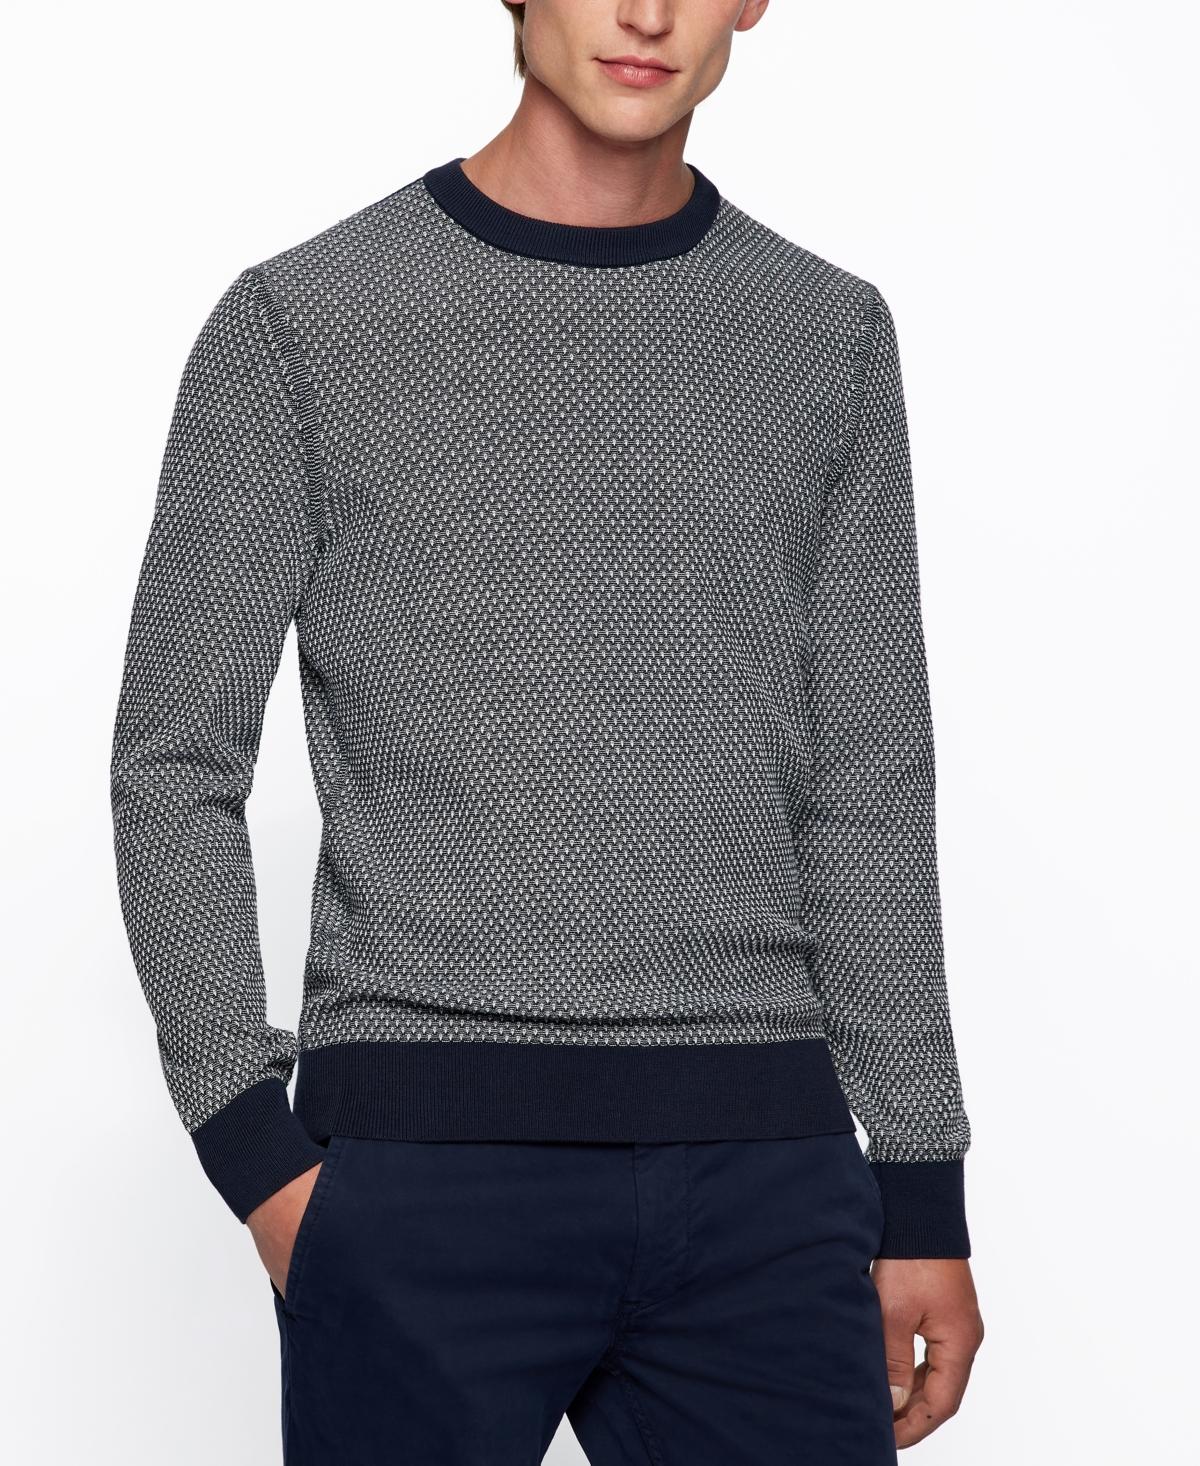 1920s Men's Sweaters, Cardigans, Knitwear Boss Mens Sweater $148.00 AT vintagedancer.com